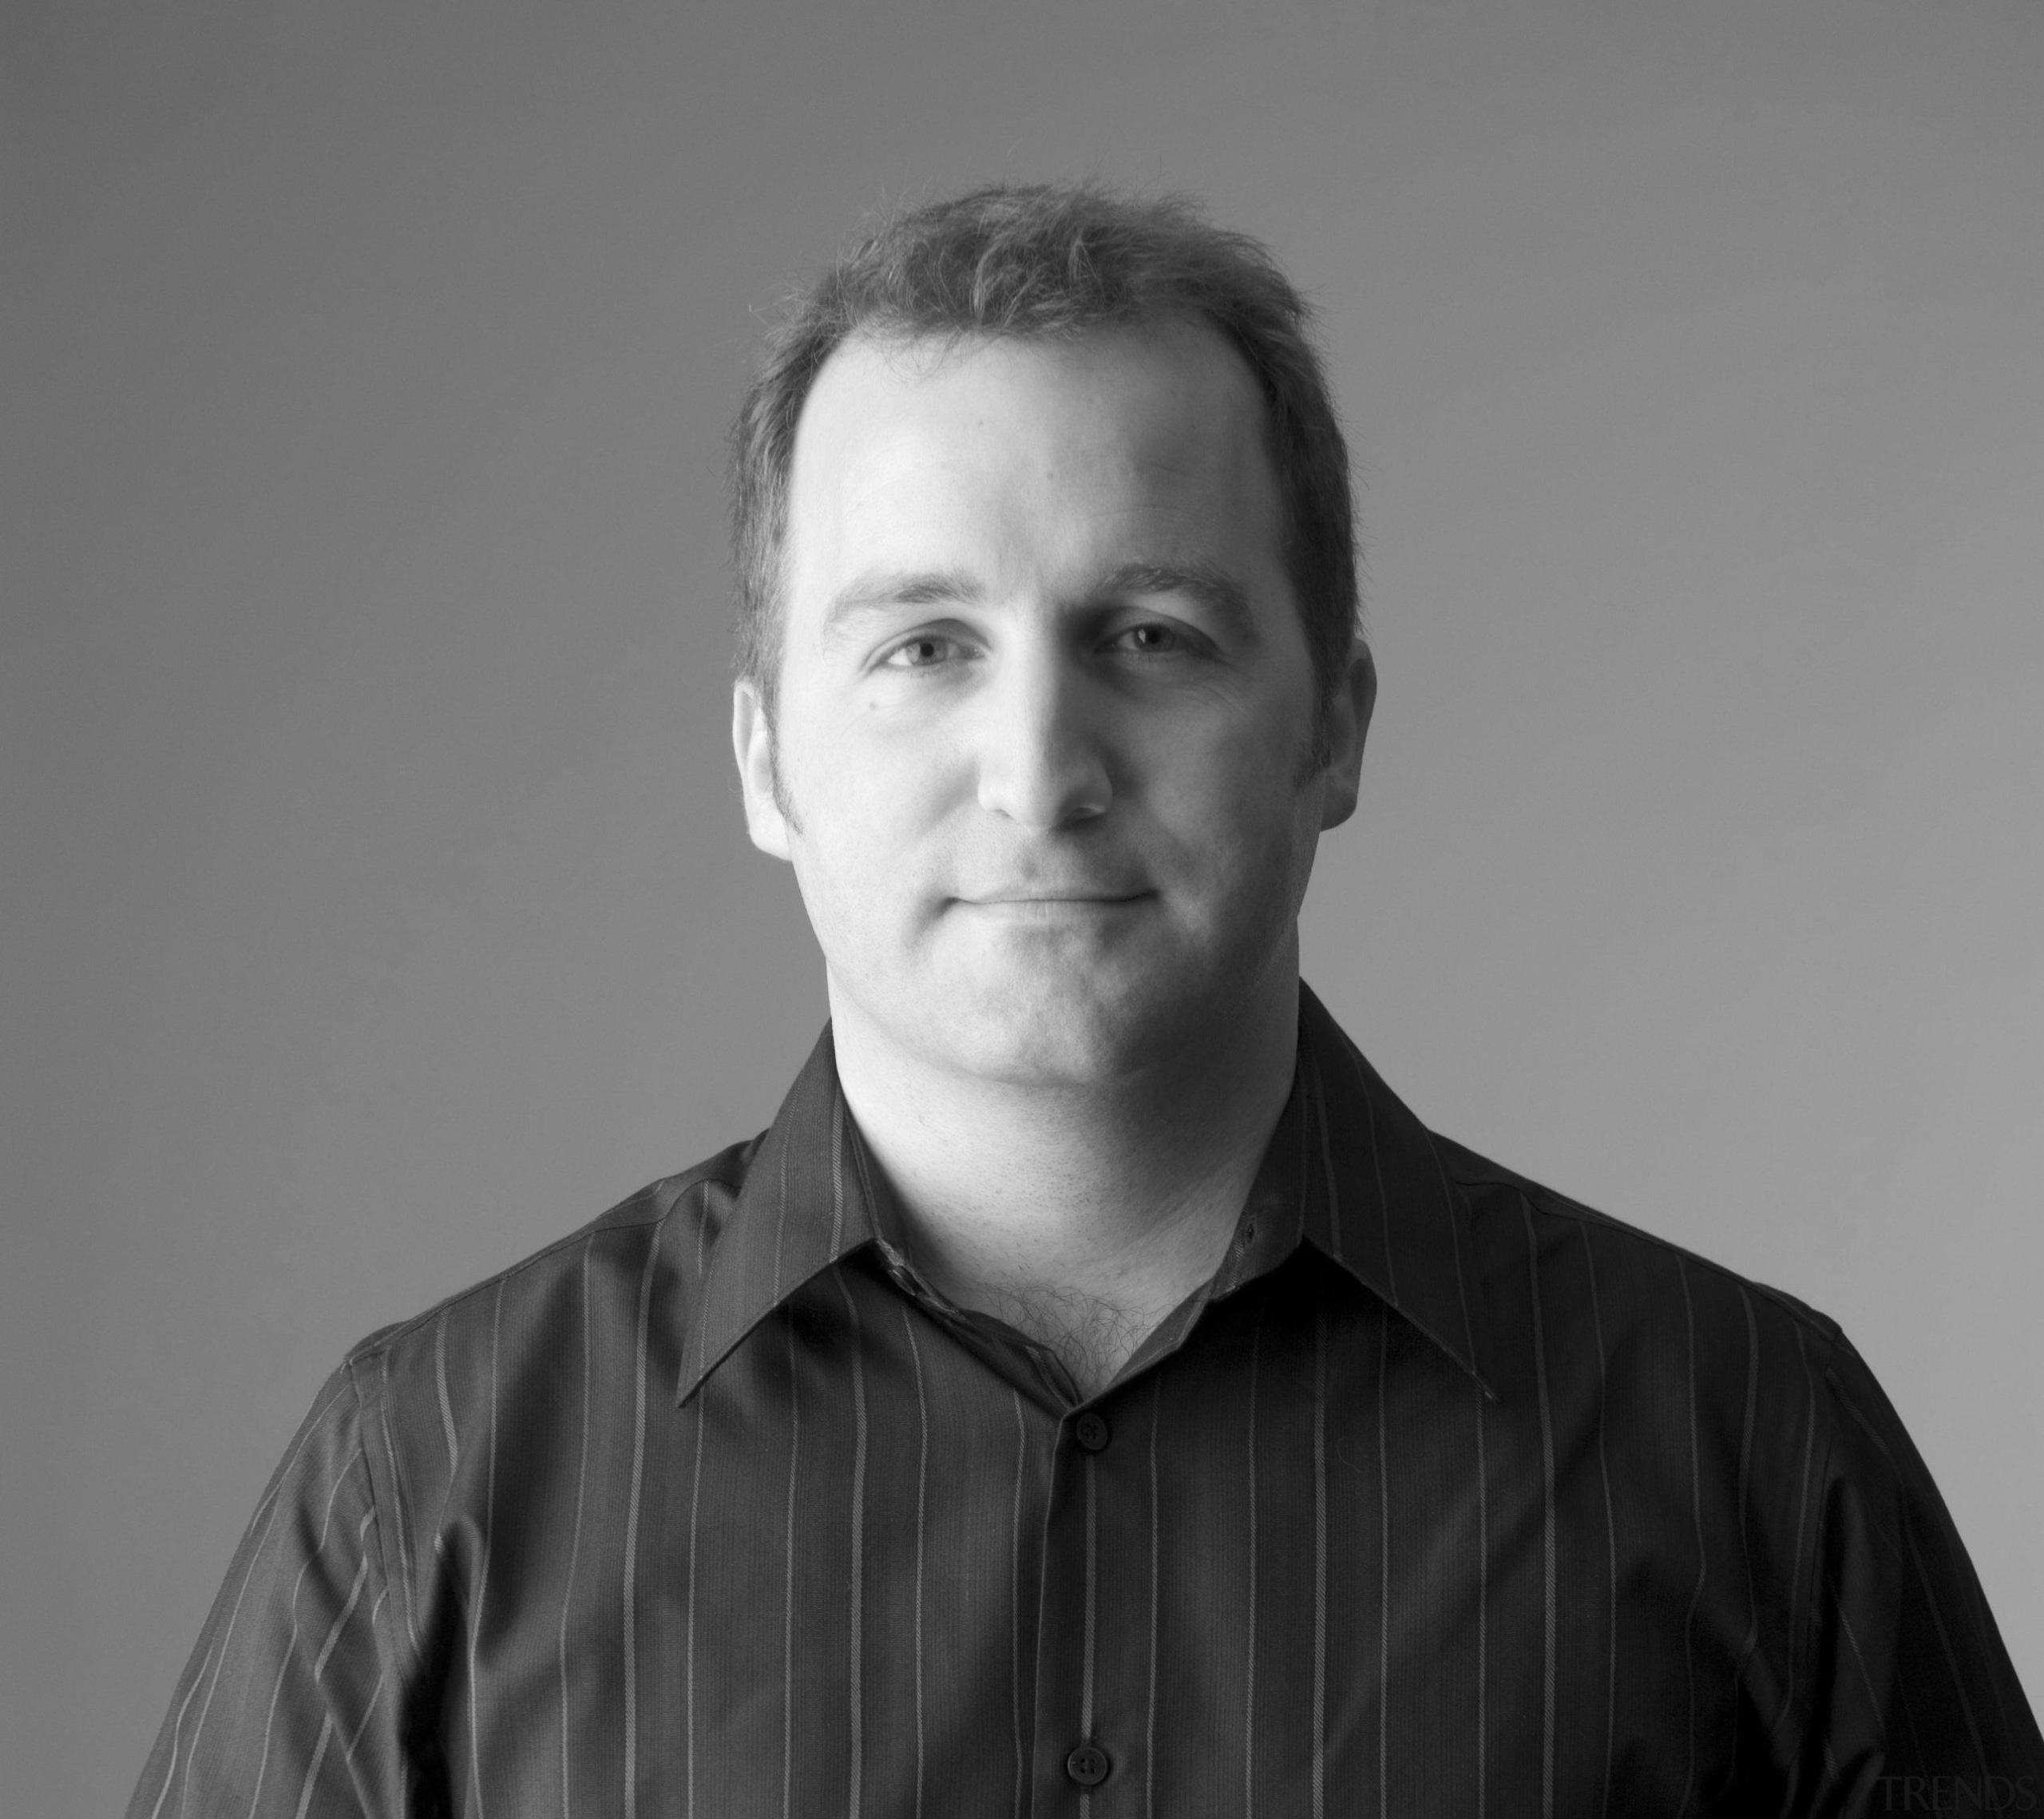 Senior principal of global architecture company Populous Tom gentleman, monochrome, photography, portrait, sitting, gray, black